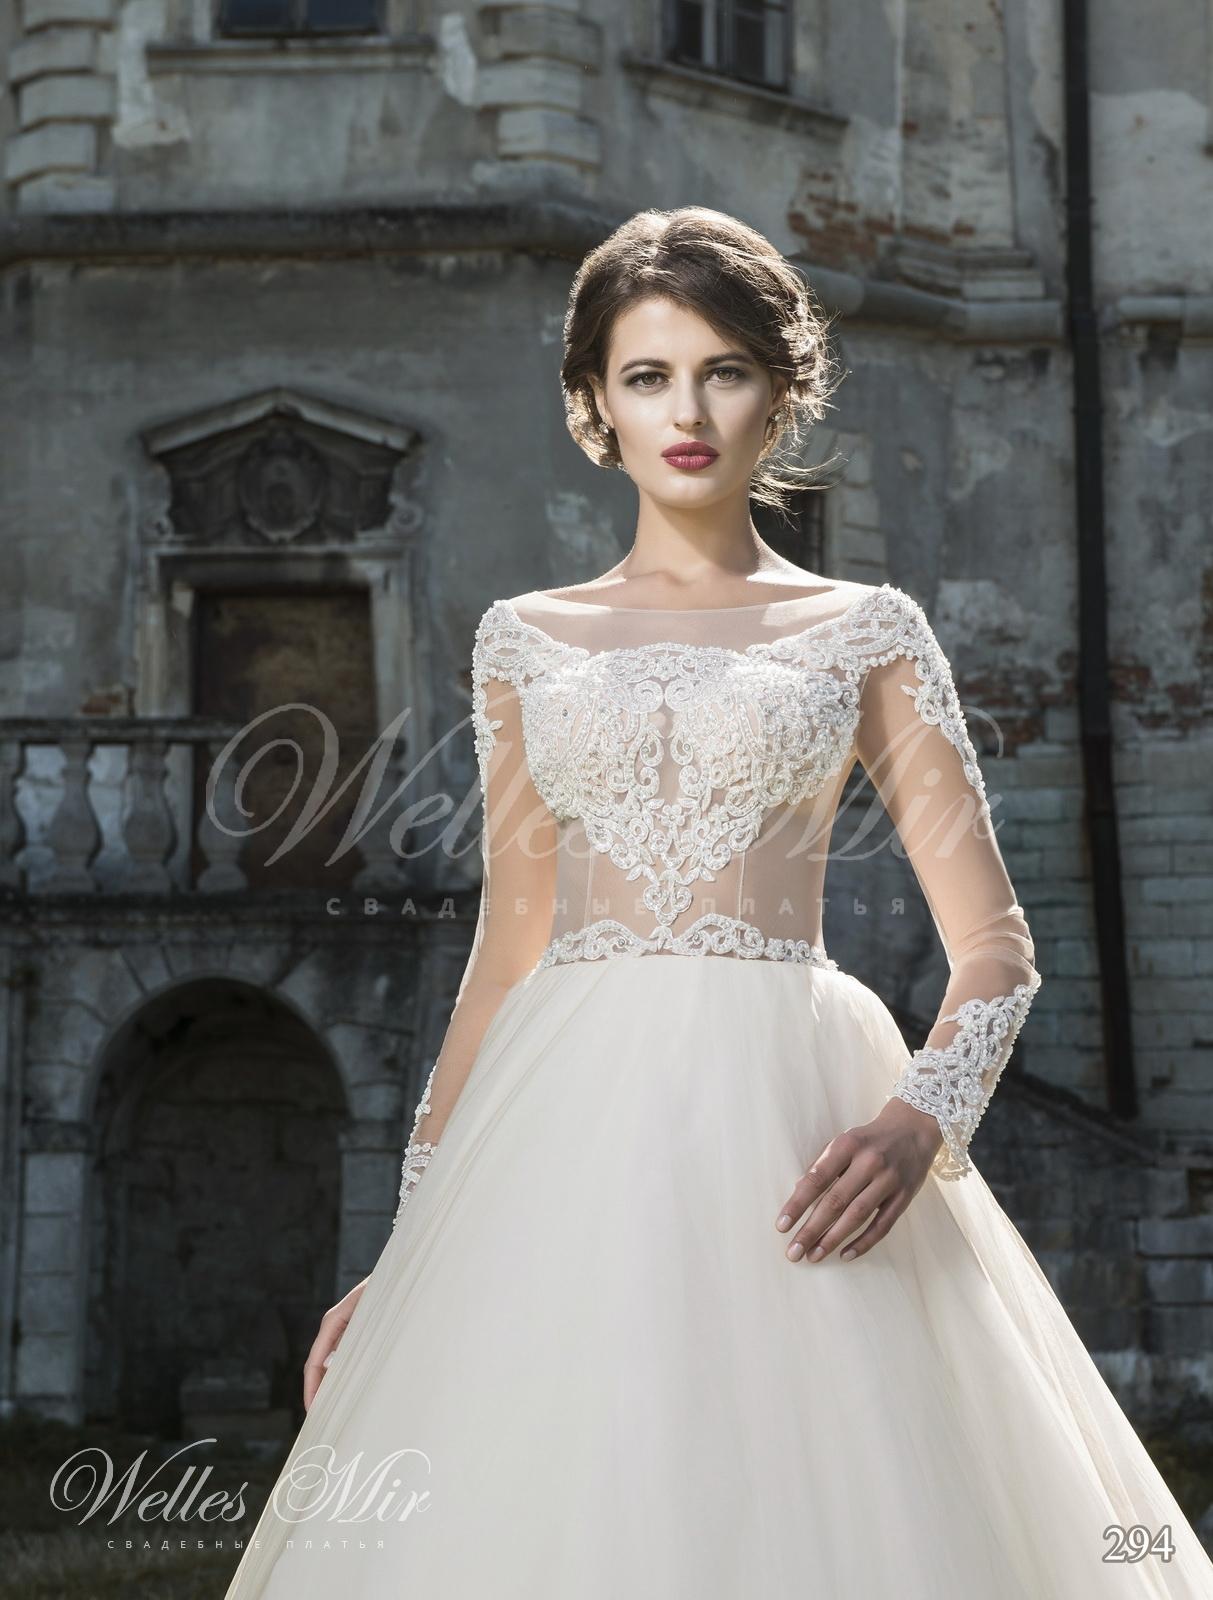 Бальна весільна сукня